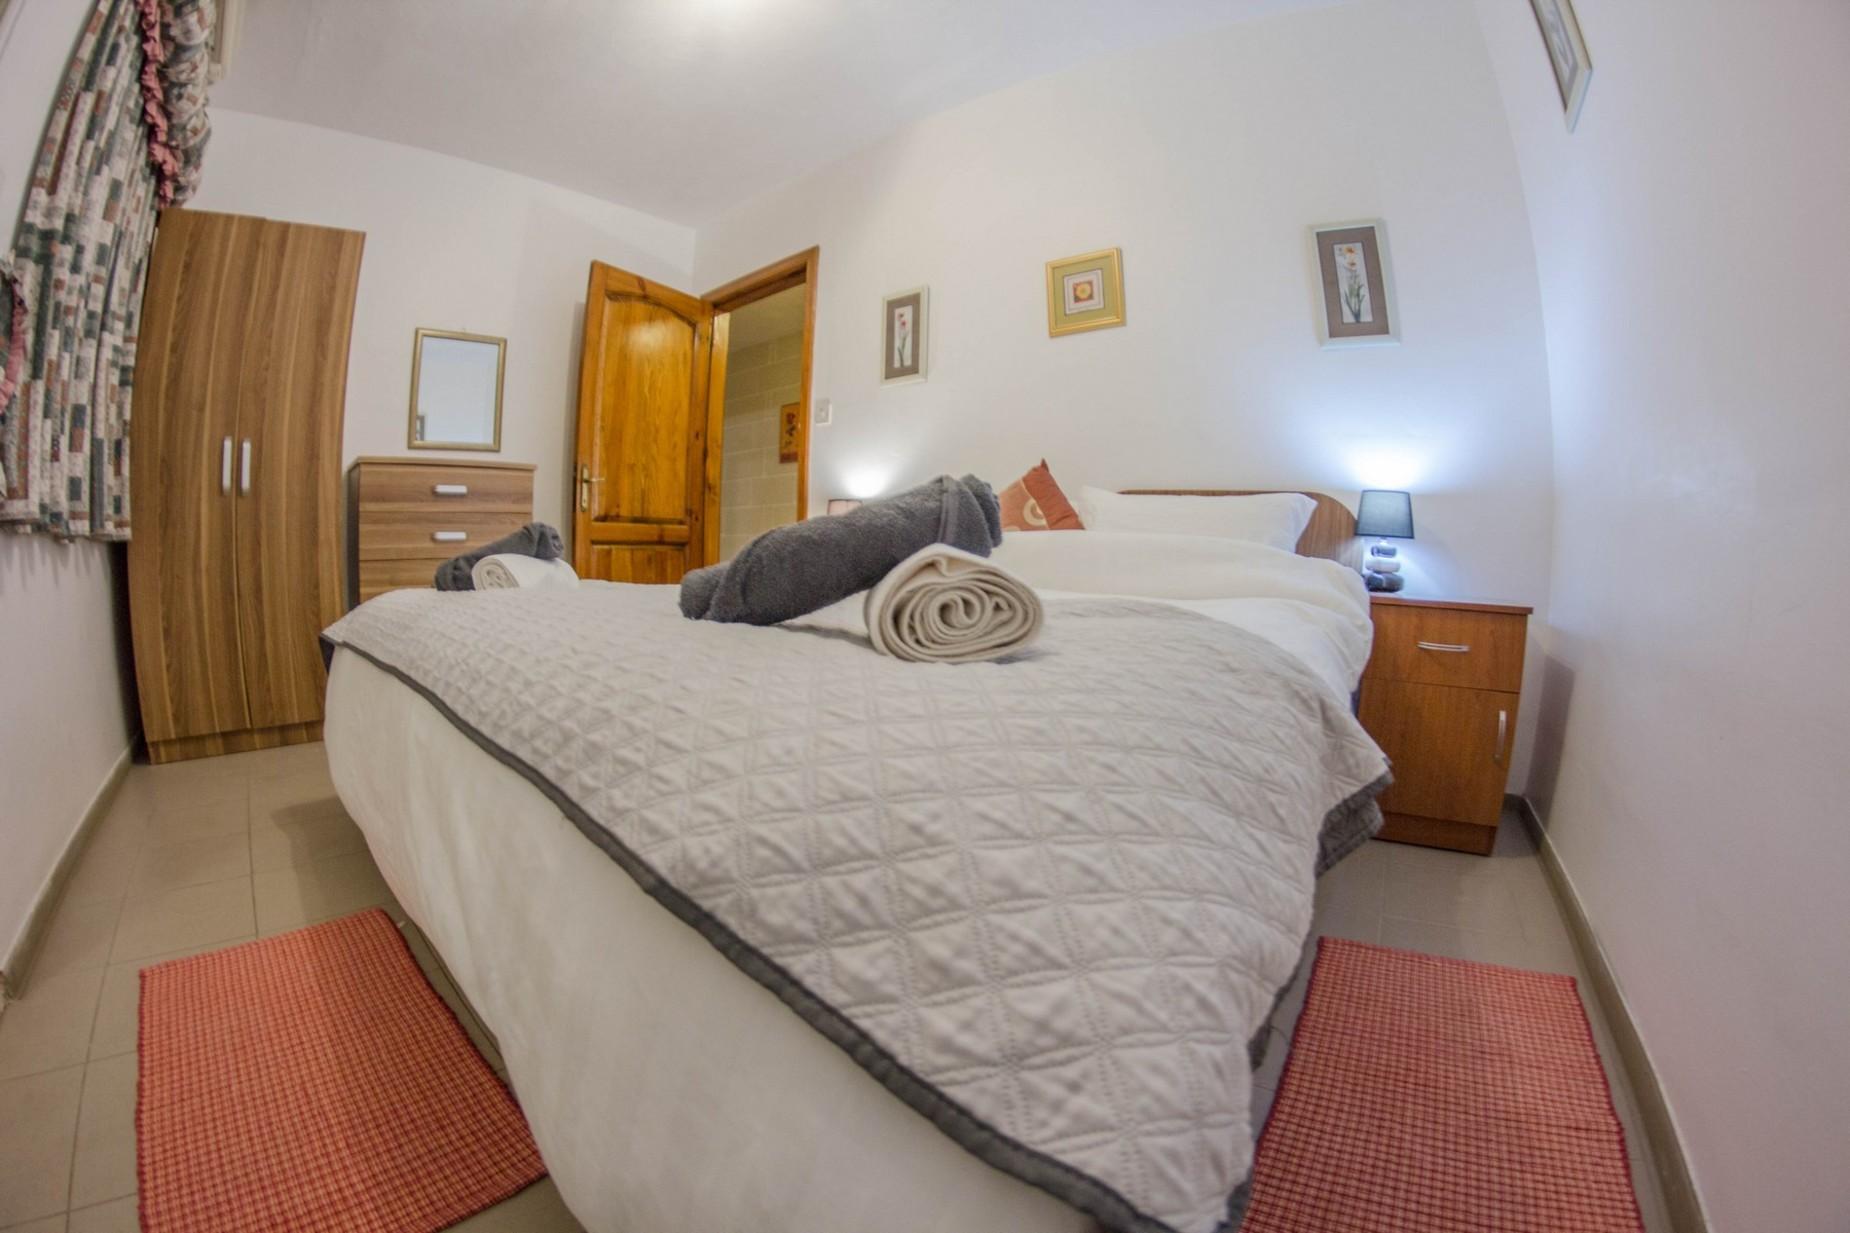 6 bed Villa For Rent in Mellieha, Mellieha - thumb 9